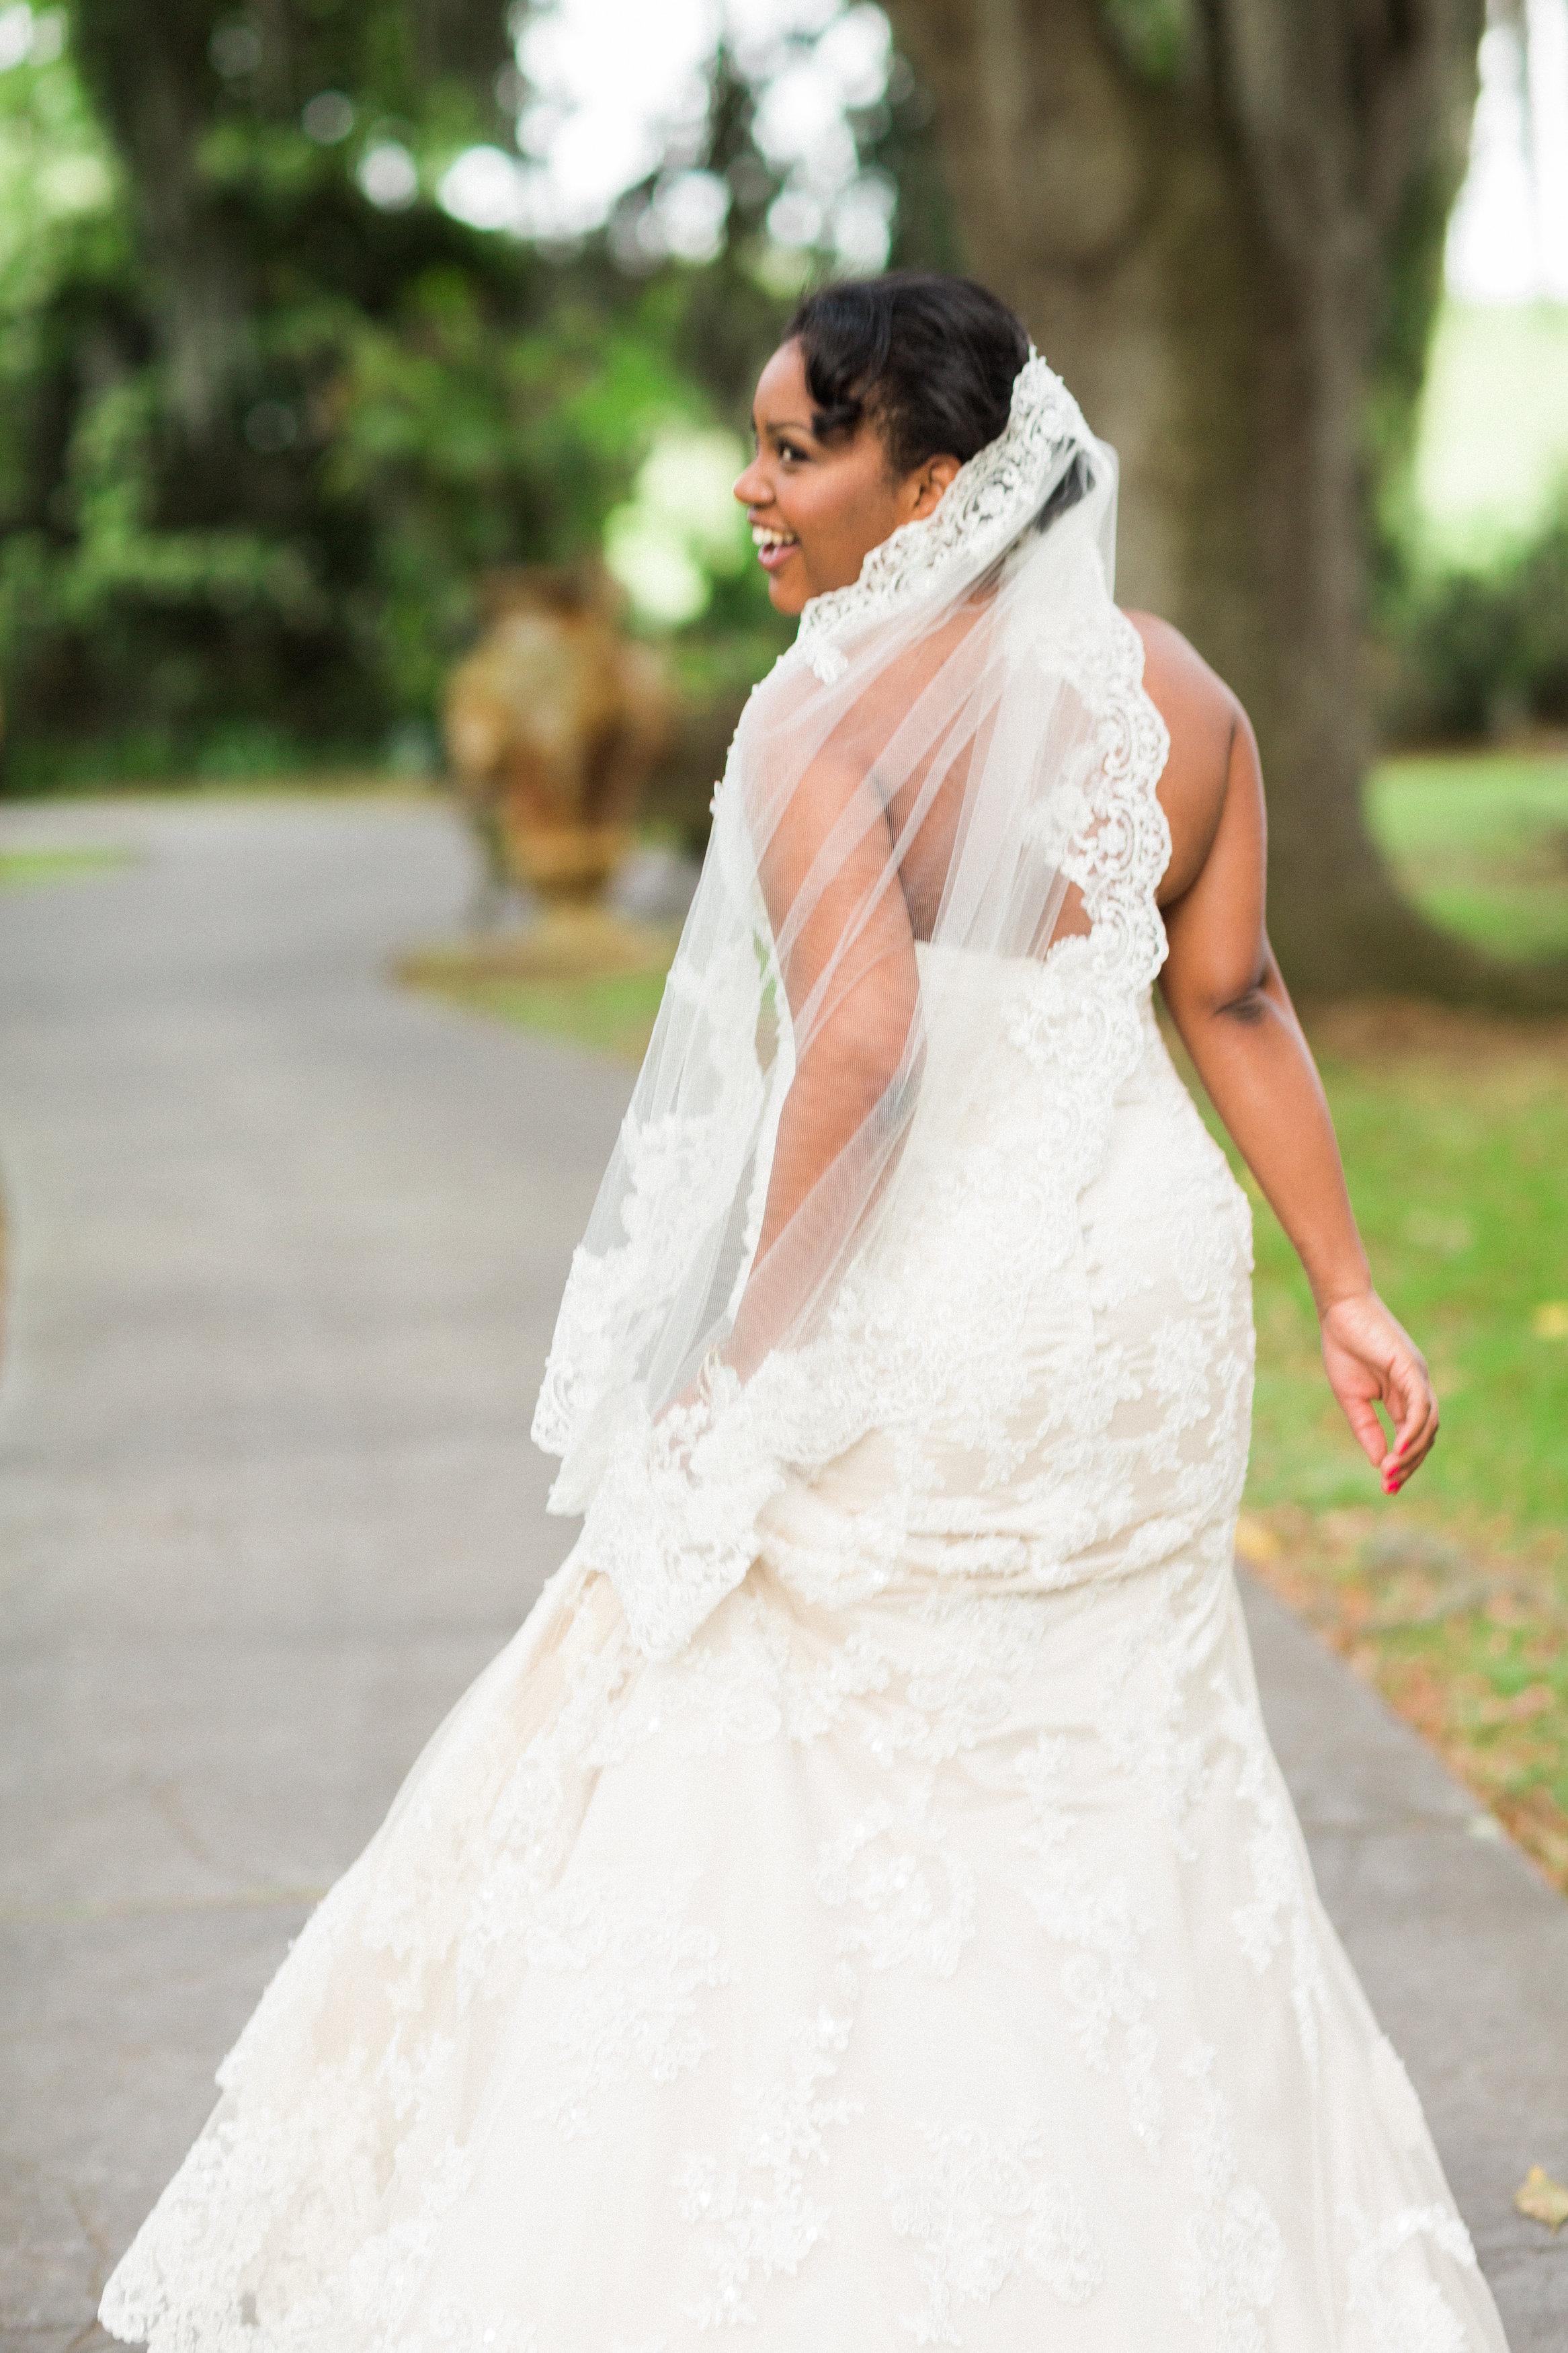 Bride - Candice Perkins 001.jpg